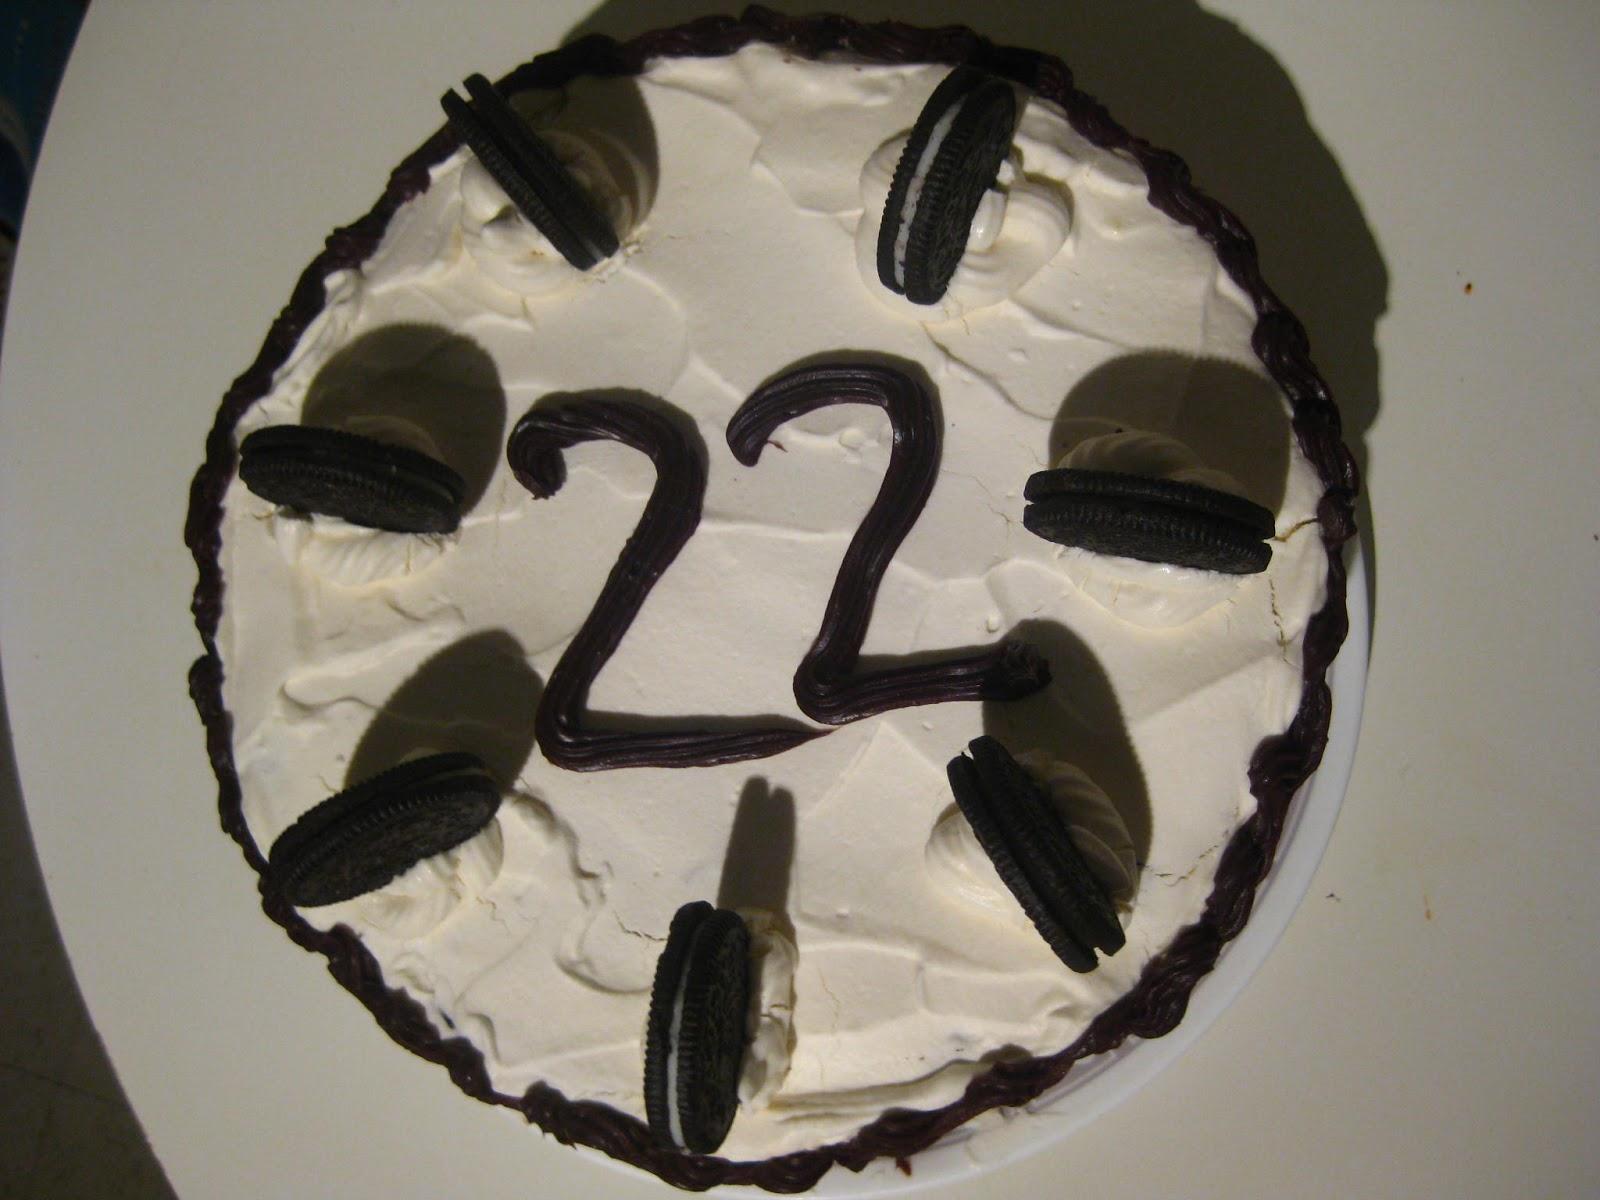 Homemade Birthday Cakes For Boyfriend When i asked the boyfriend